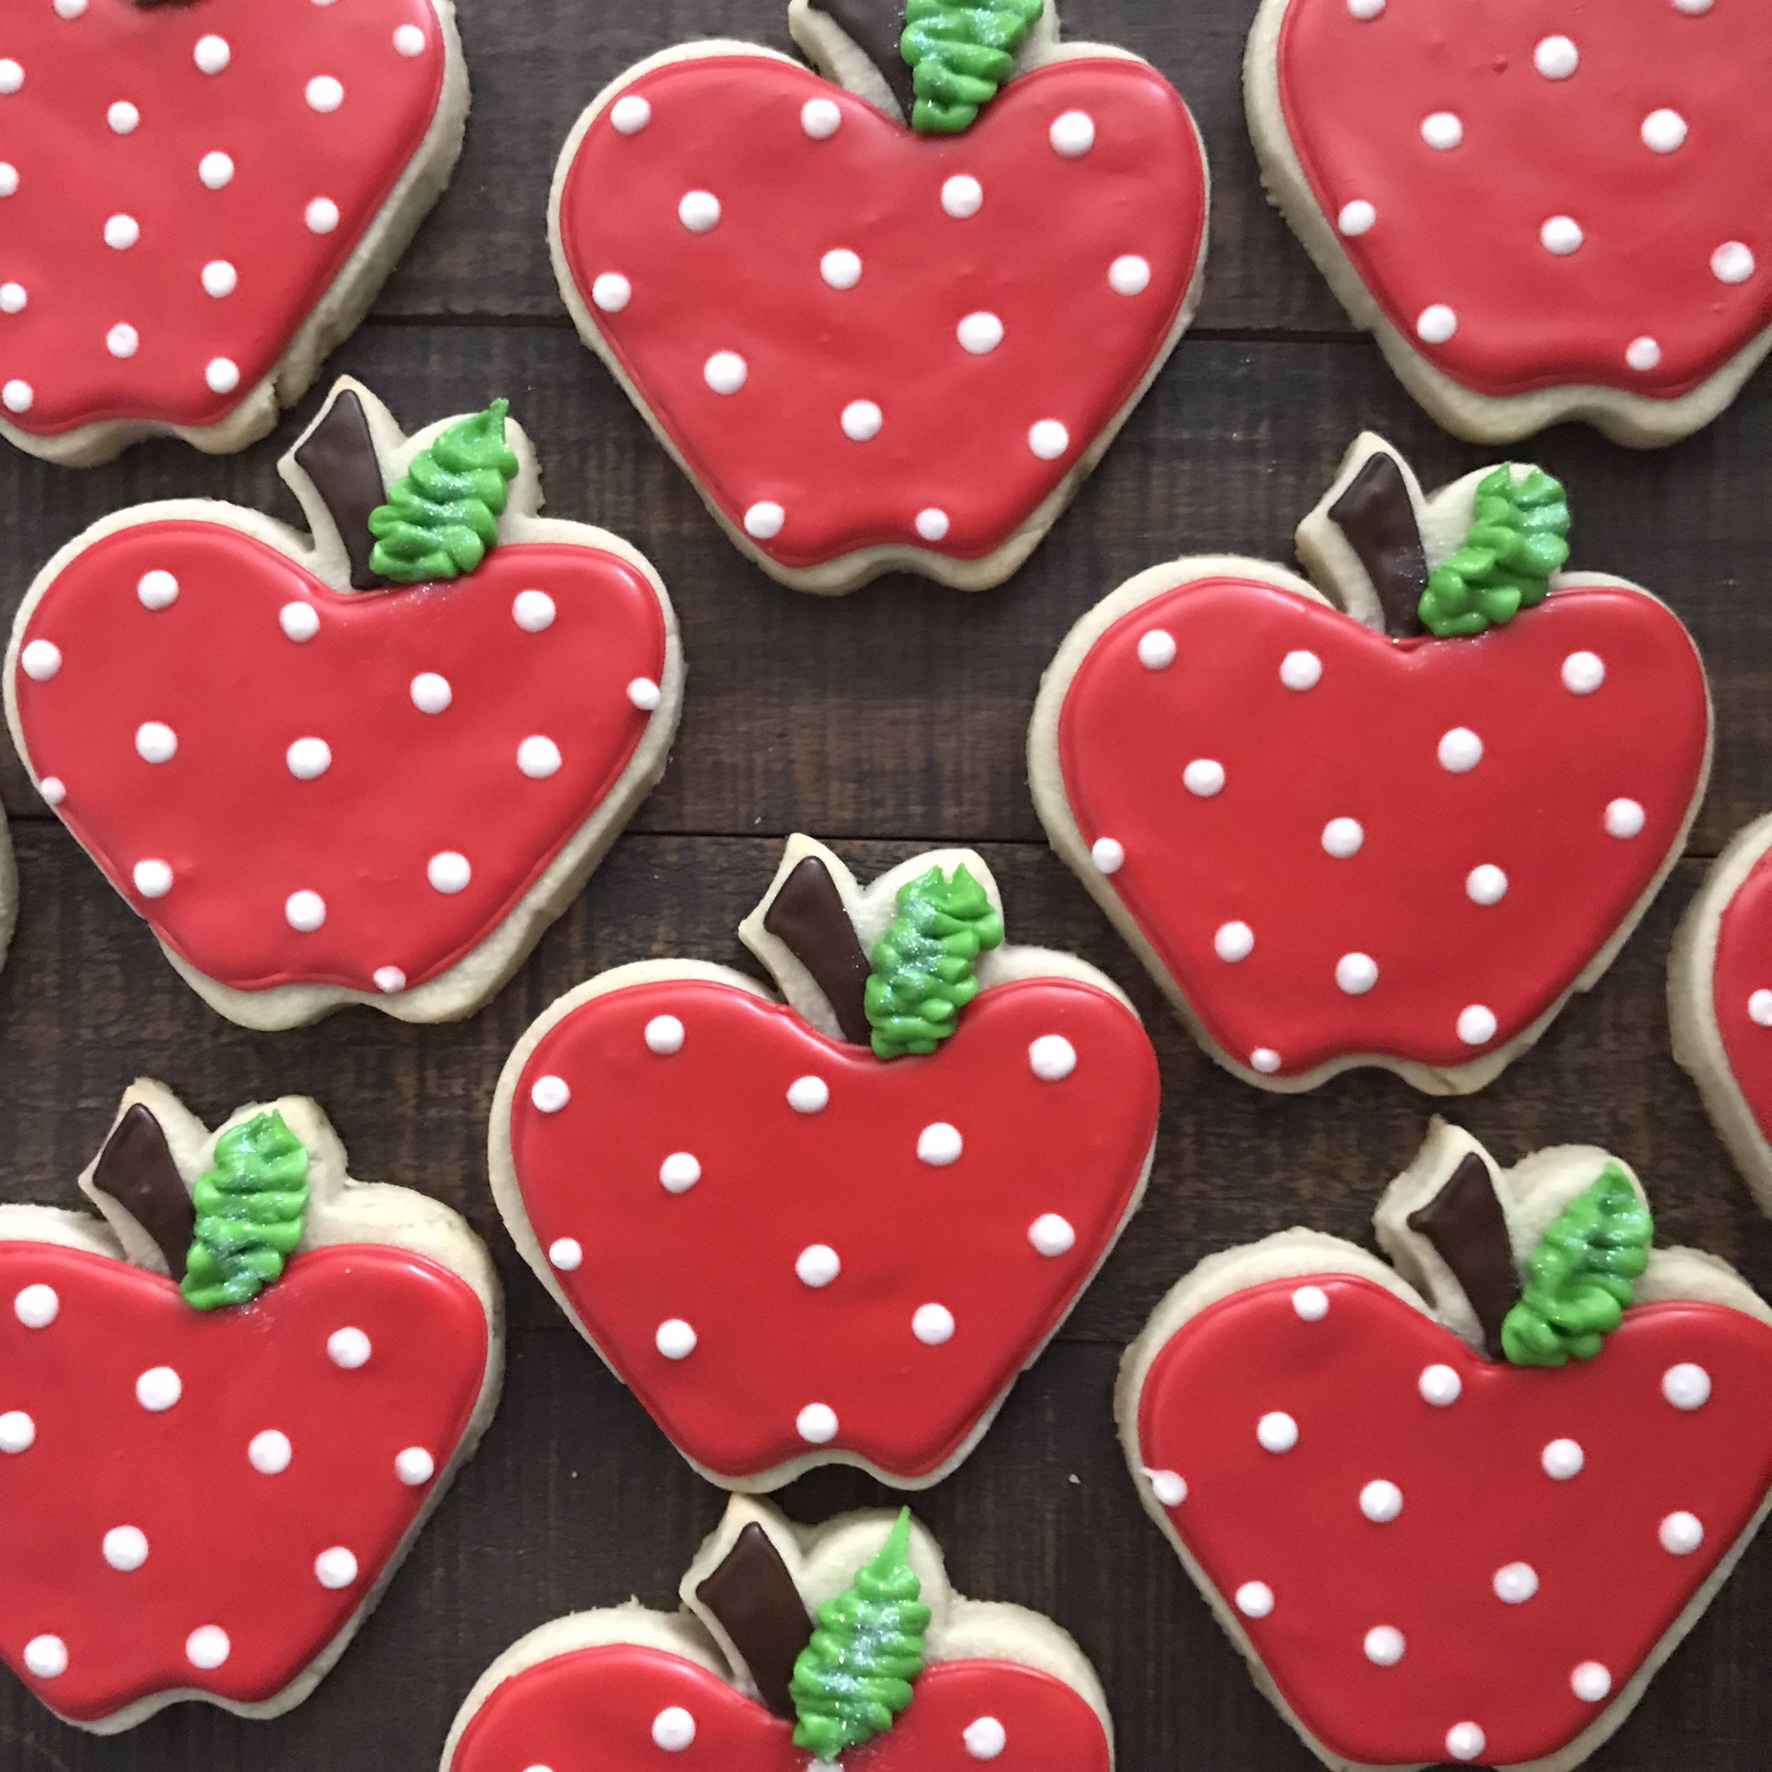 Polka Dot Apples